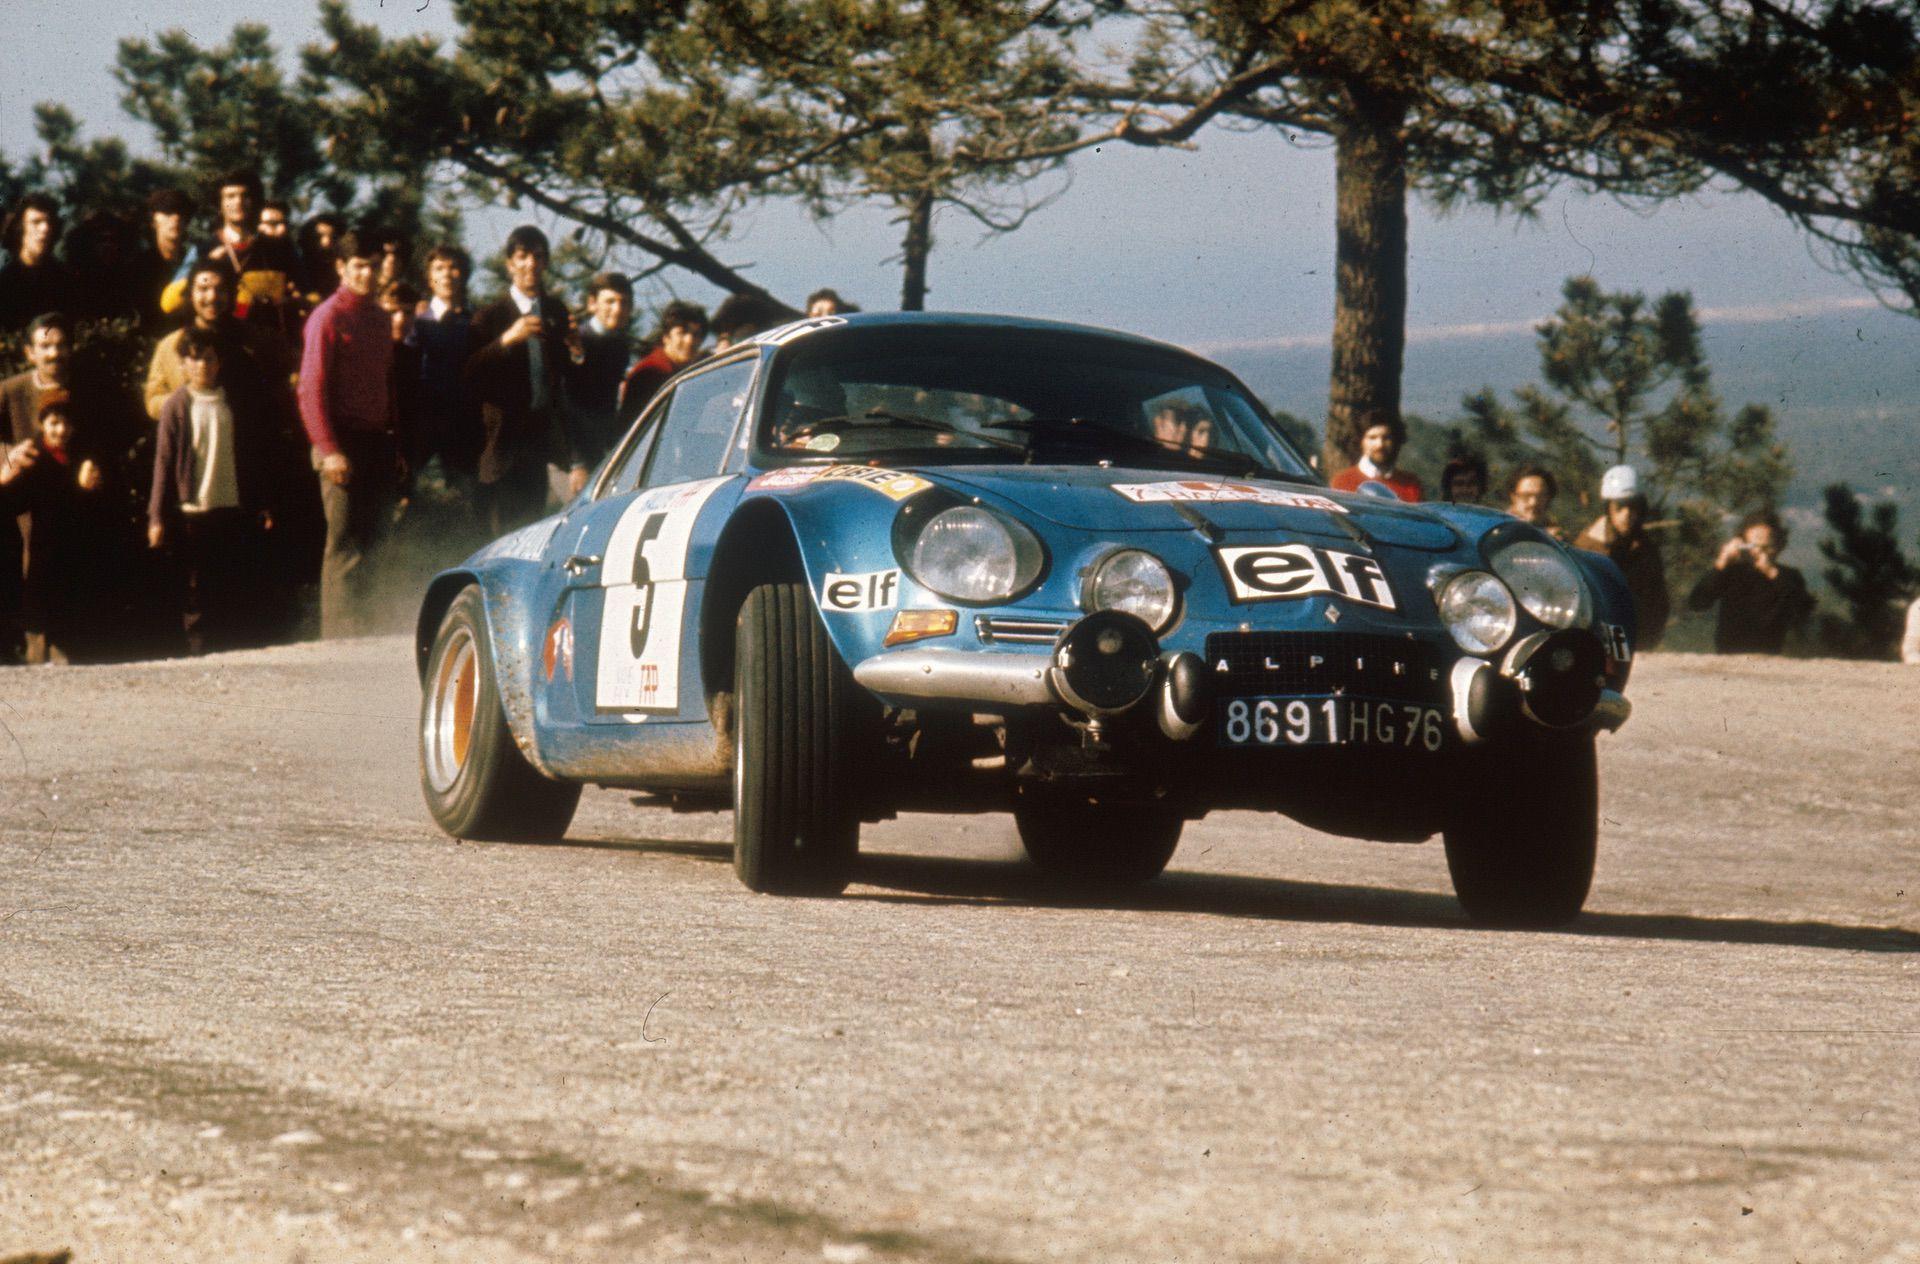 5-2021-Alpine-Story-Rallye